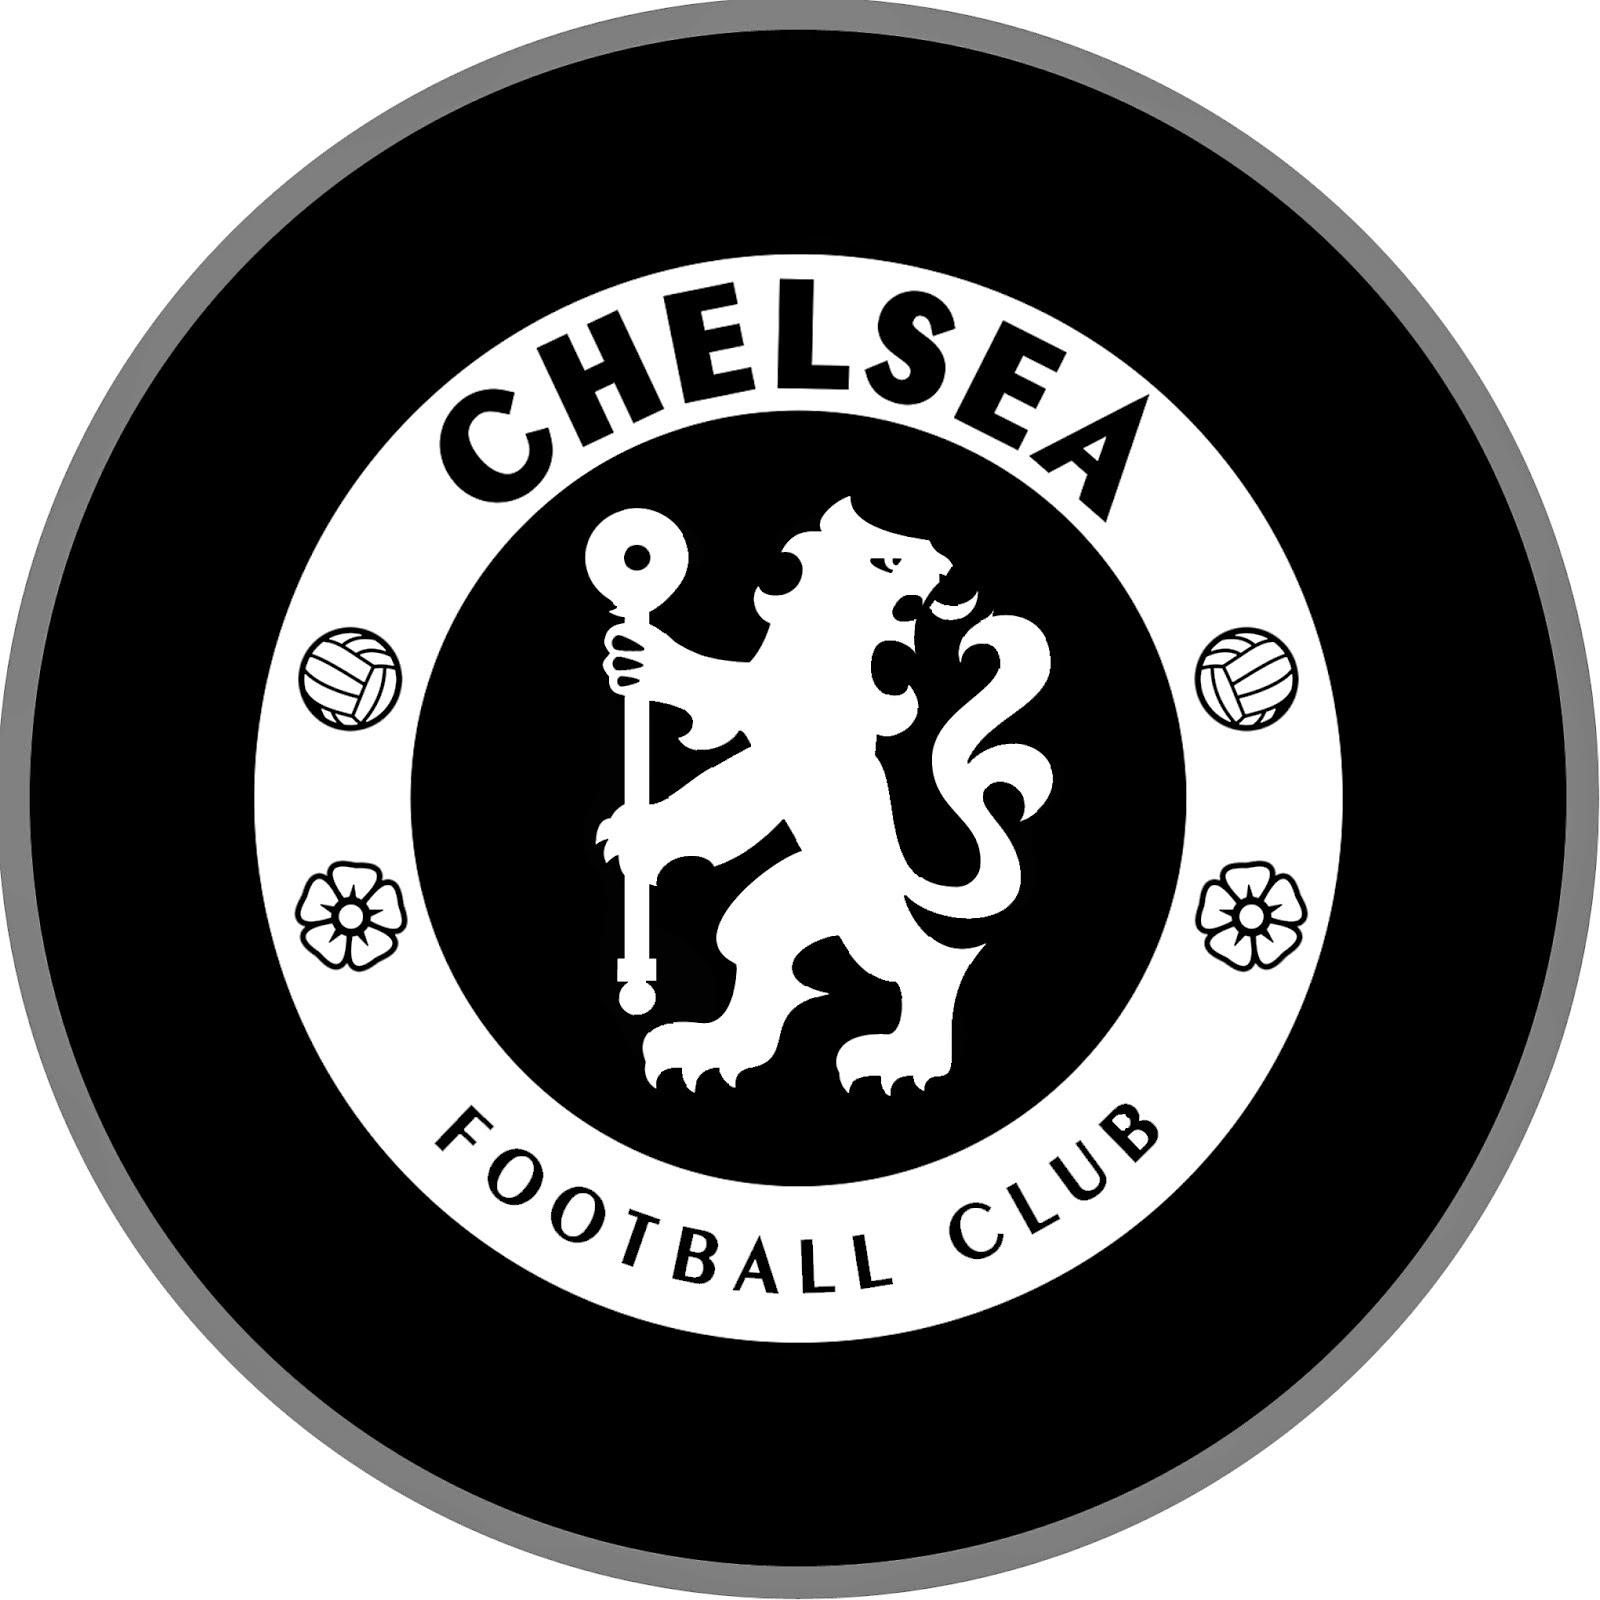 Cover Ban Serep Mobil Club Sepak Bola Chelsea